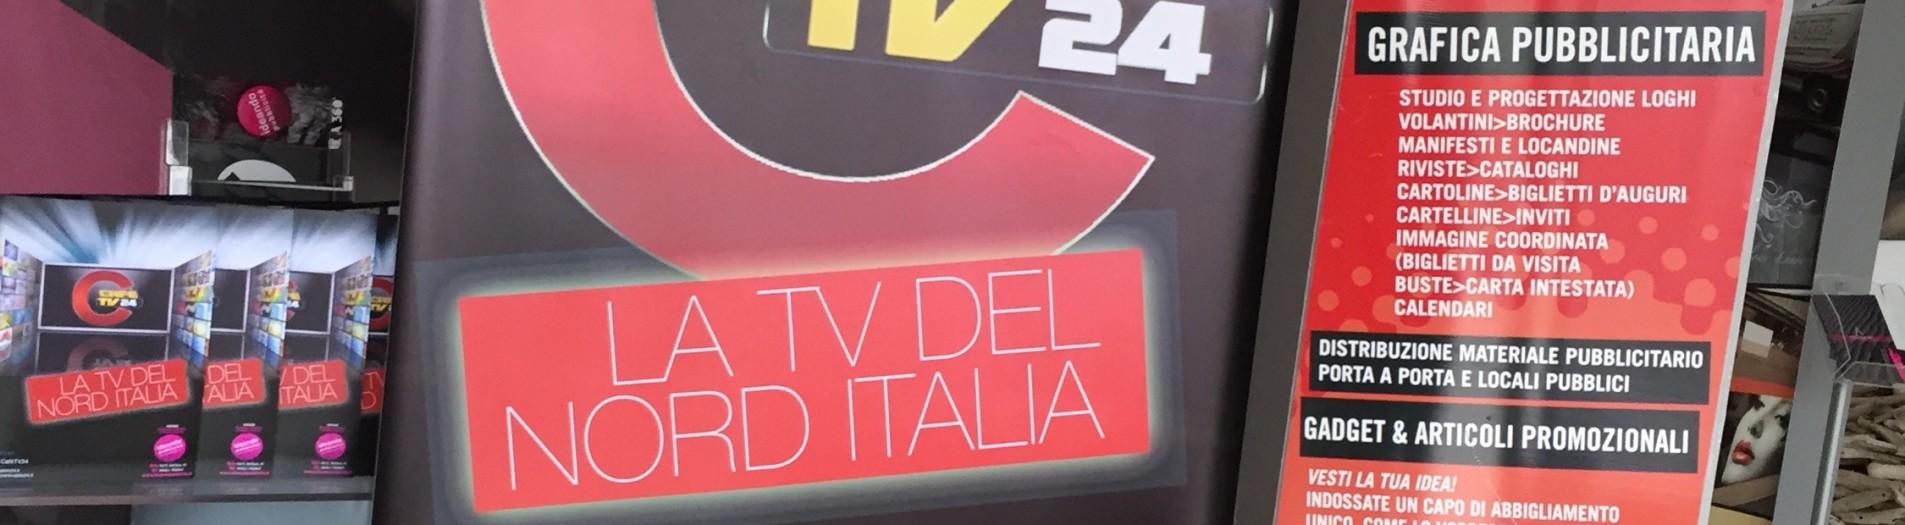 CAFÉ TV 24 partner IDEANDO PUBBLICITÀ